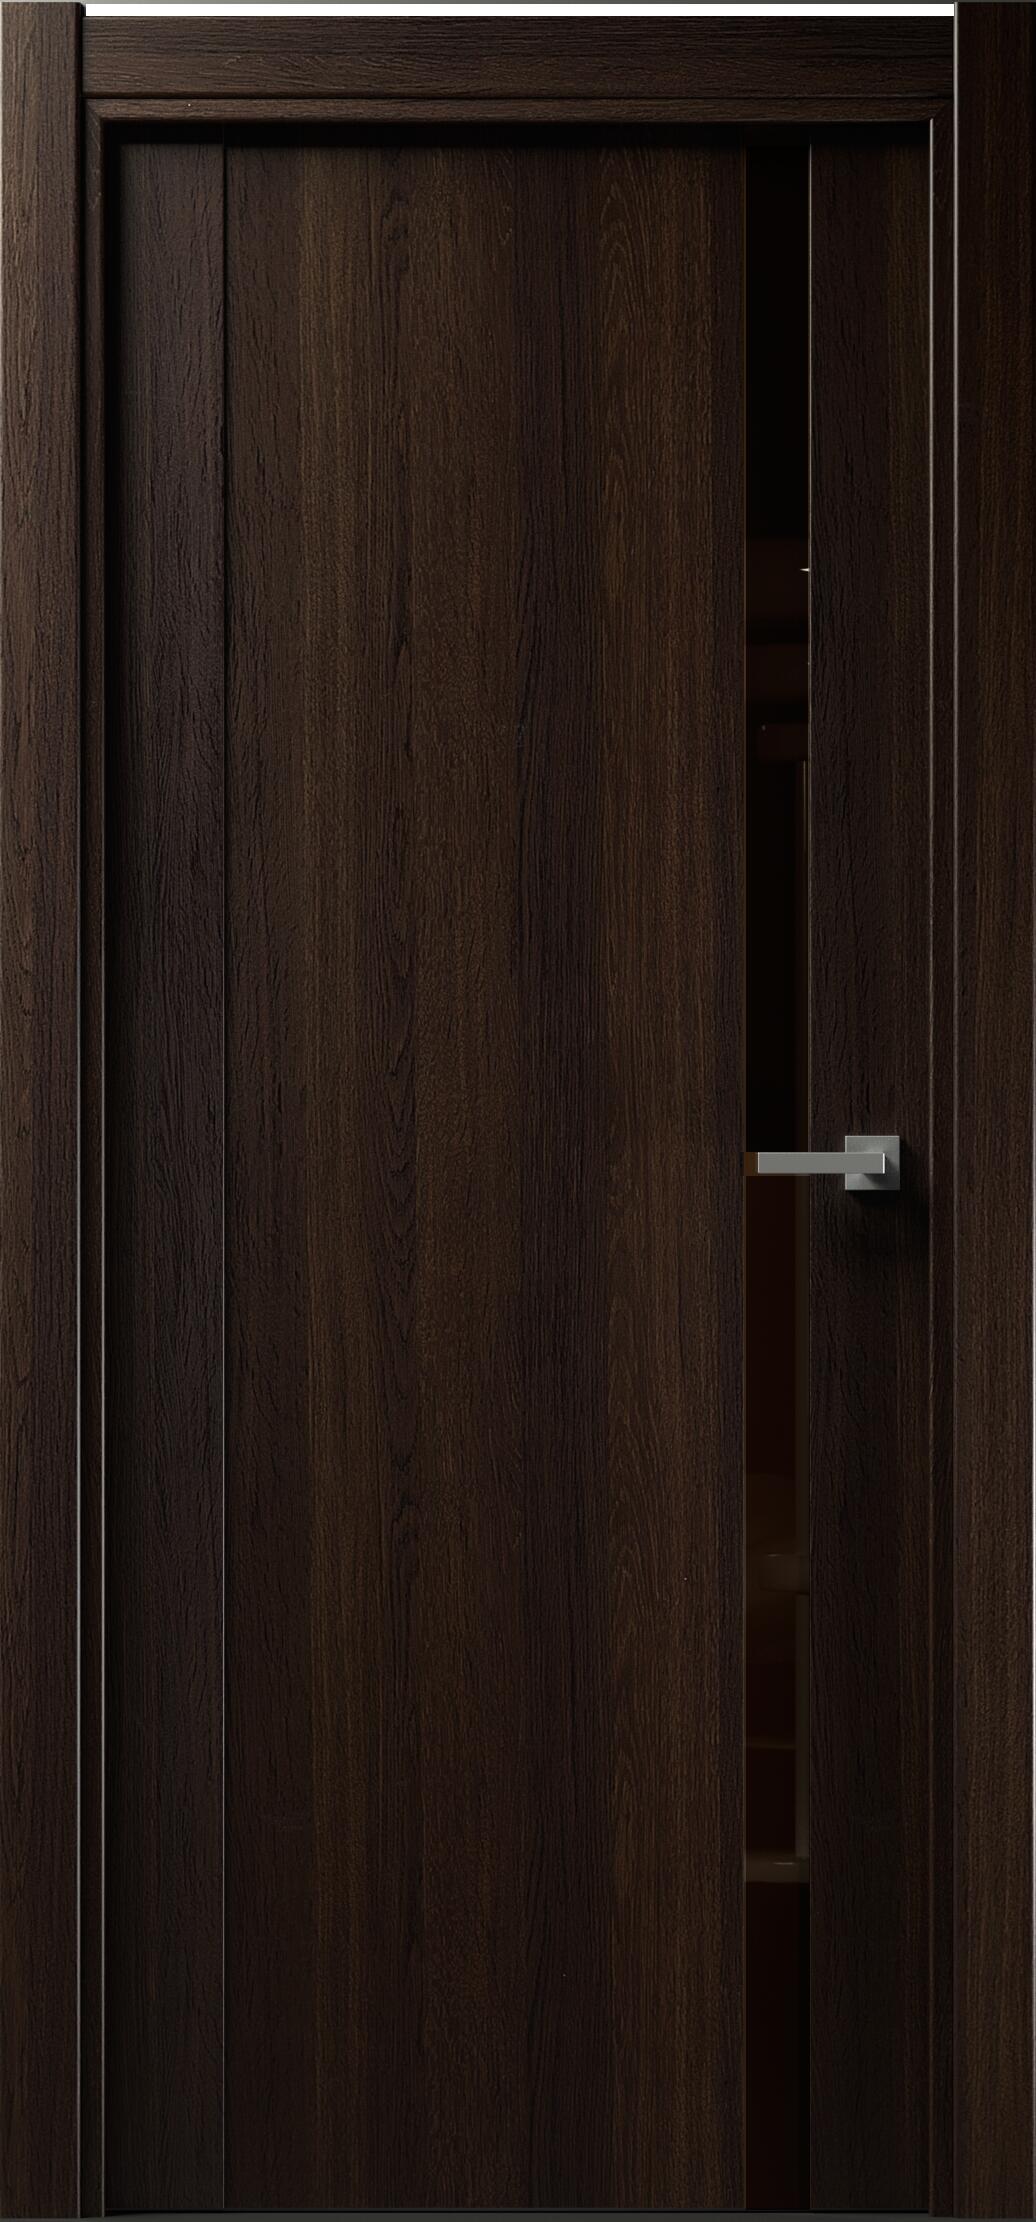 Коллекция Futura 321 Орех + Лакобель коричневое